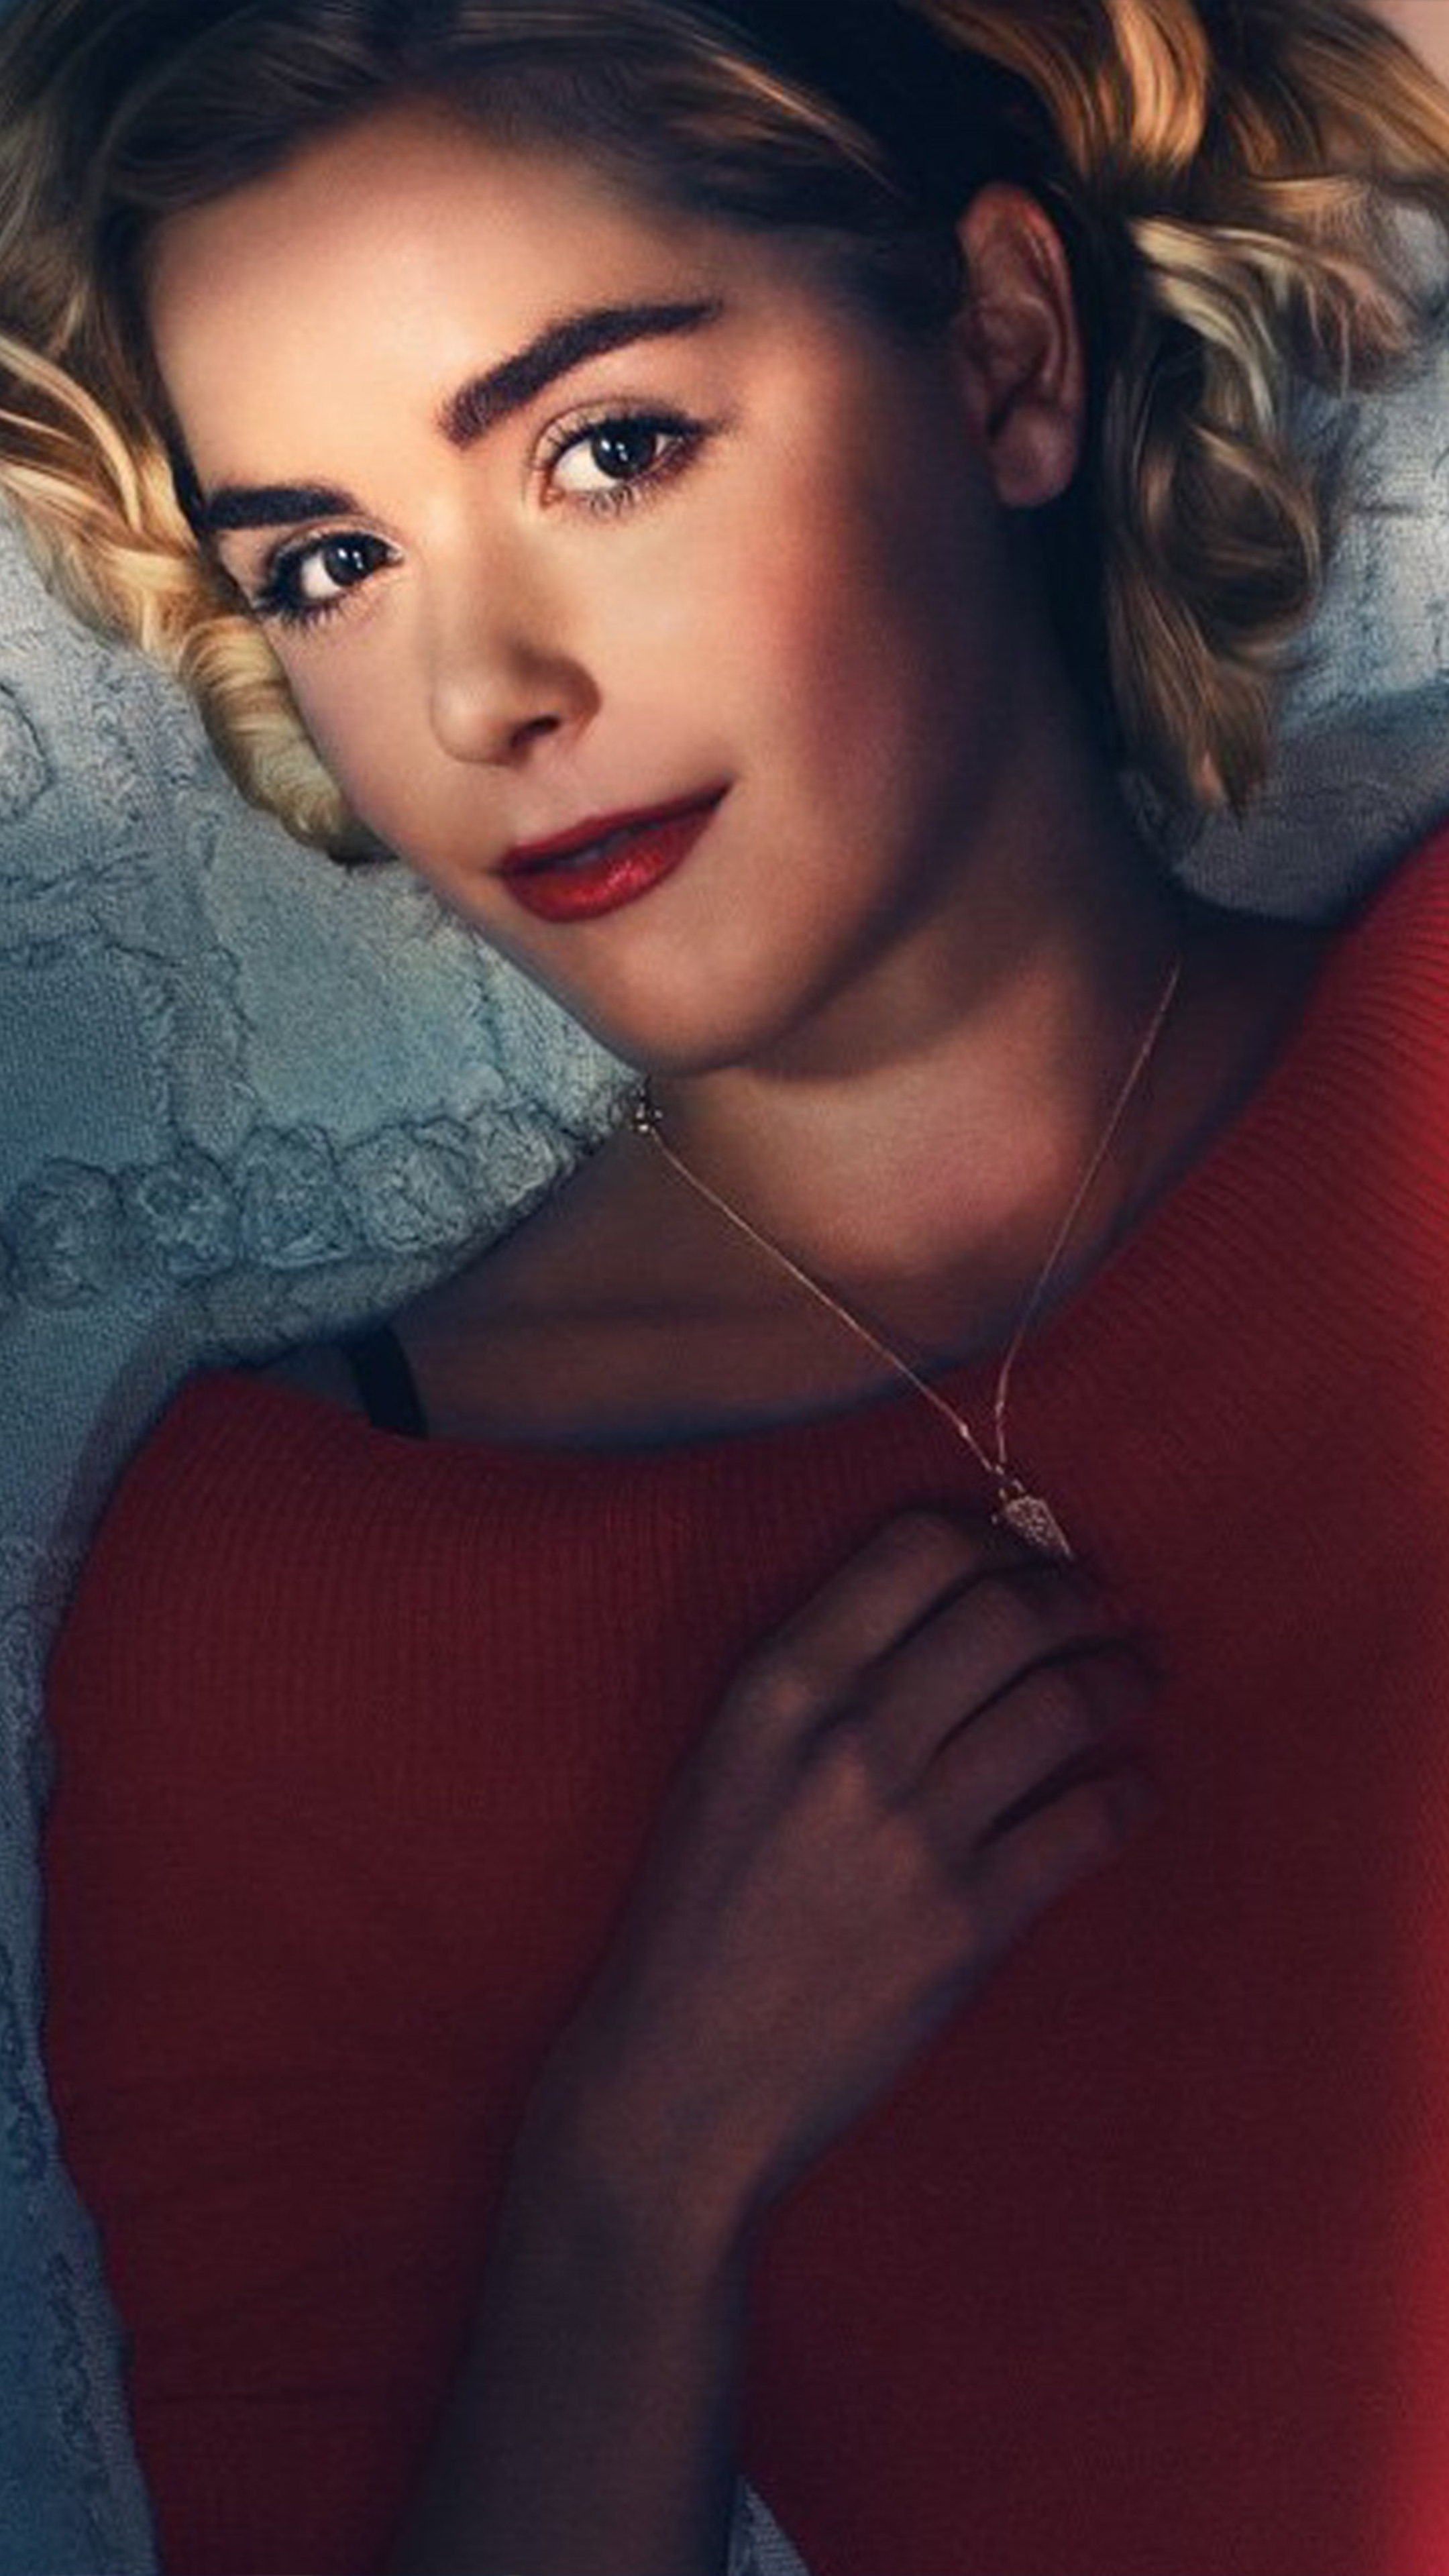 Kiernan Shipka In The Chilling Adventures Of Sabrina Series Free